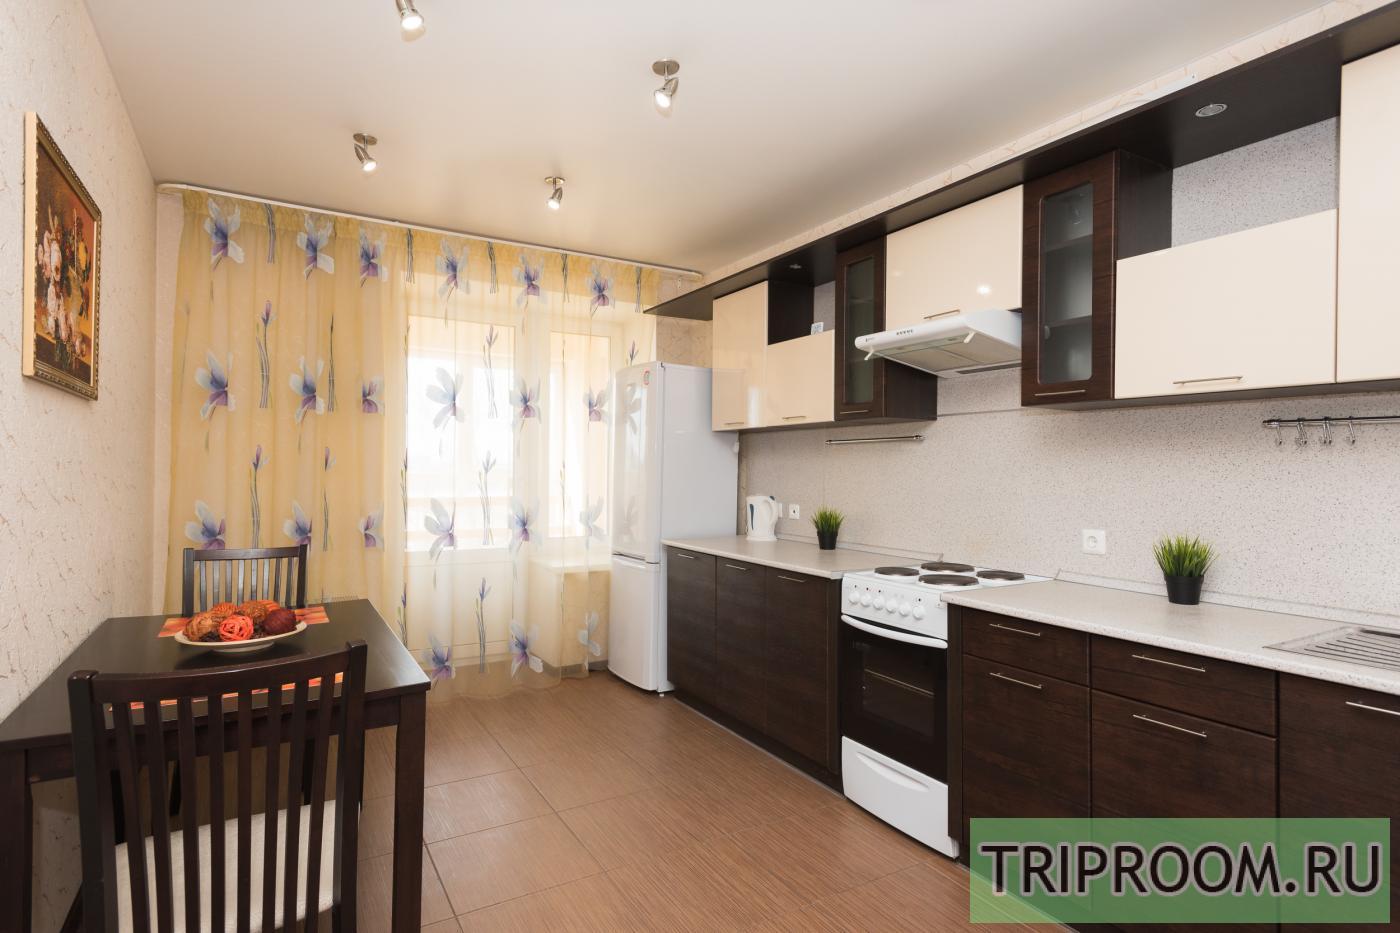 1-комнатная квартира посуточно (вариант № 16259), ул. Смазчиков улица, фото № 3